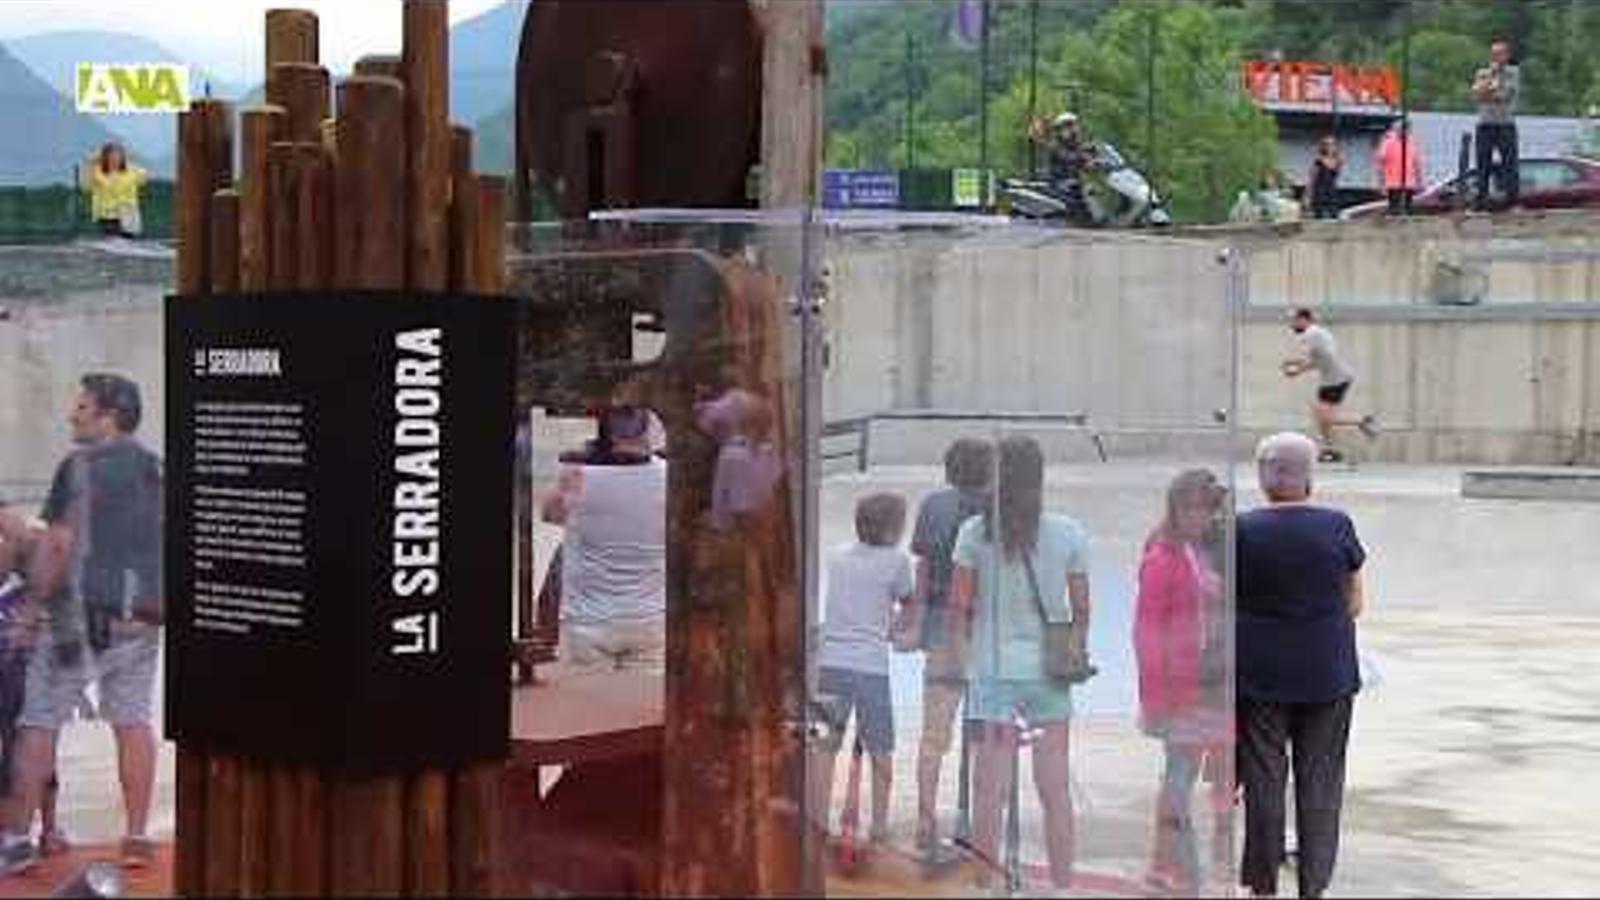 Santa Coloma estrena un nou espai d'esbarjo